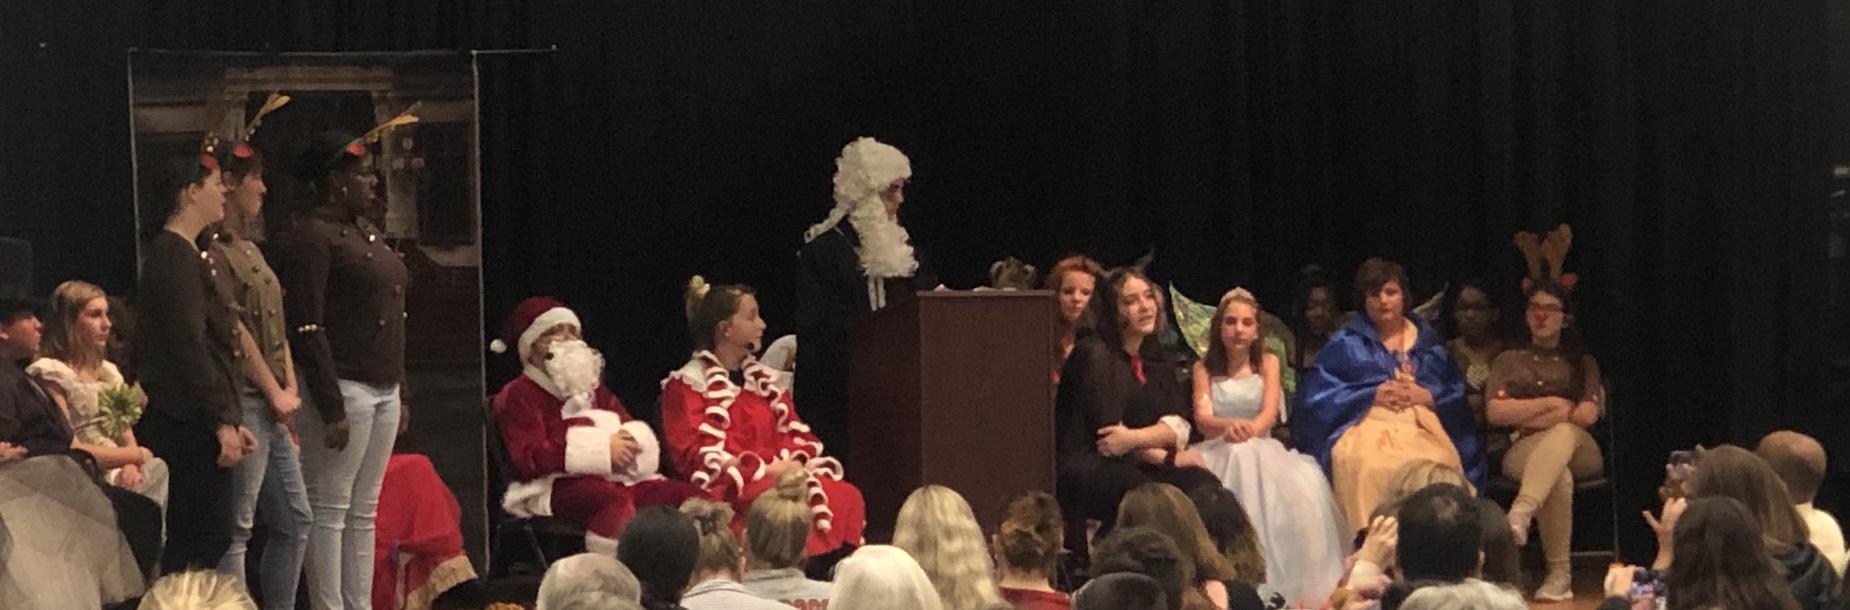 Drama Club Performs During Winter Fine Arts Program